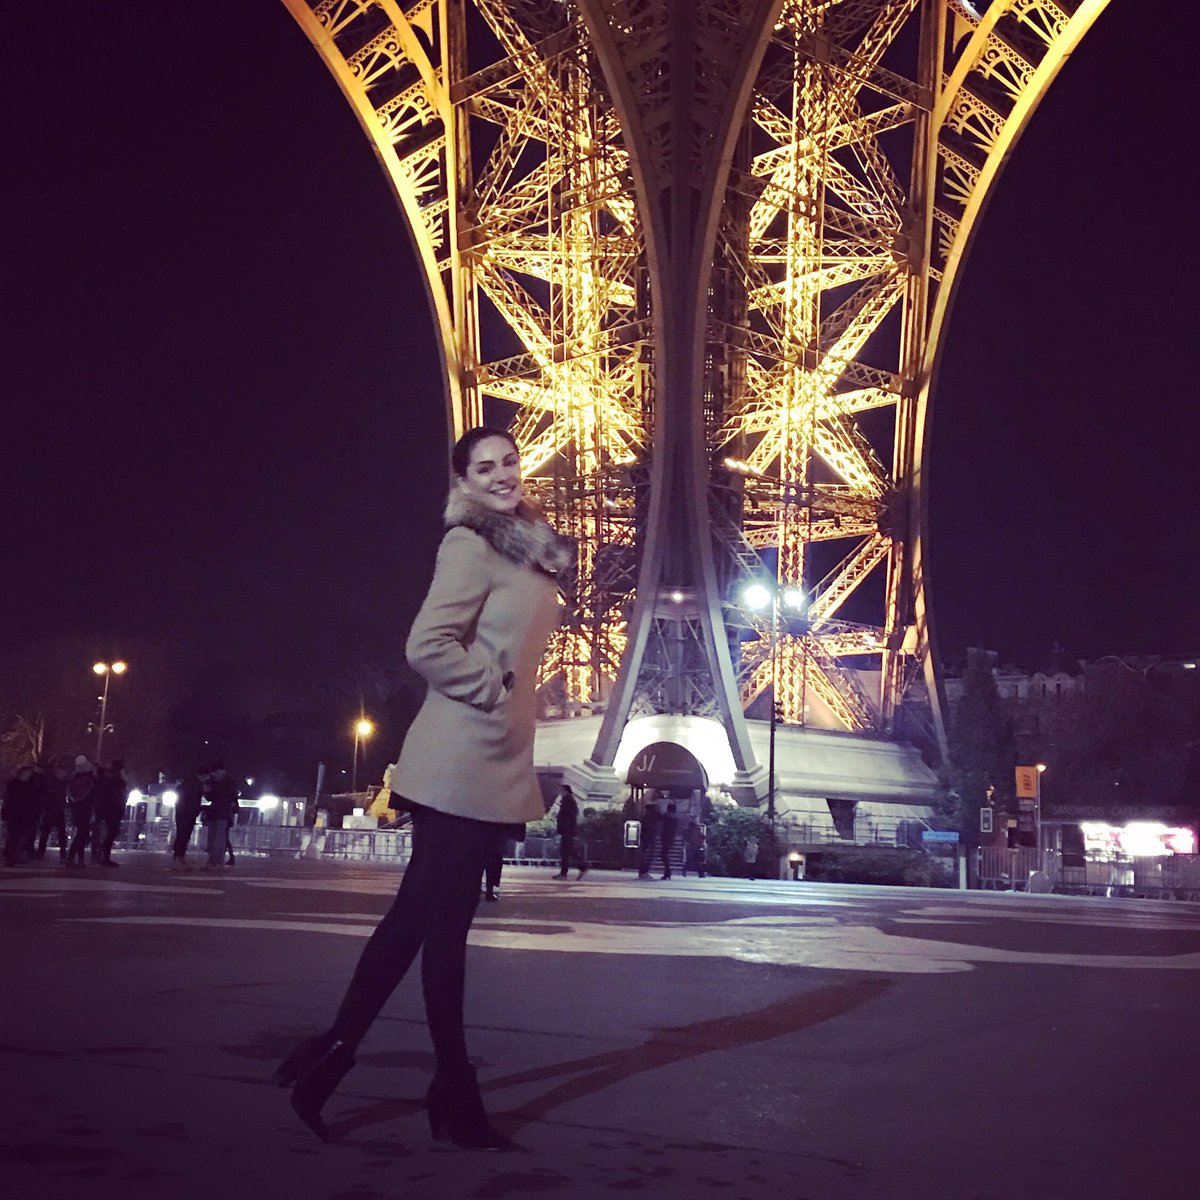 My Boyfriend Took me up the Eiffel Last Night ????????????????????????✨????????????⭐️ https://t.co/NBEhTcSP1c